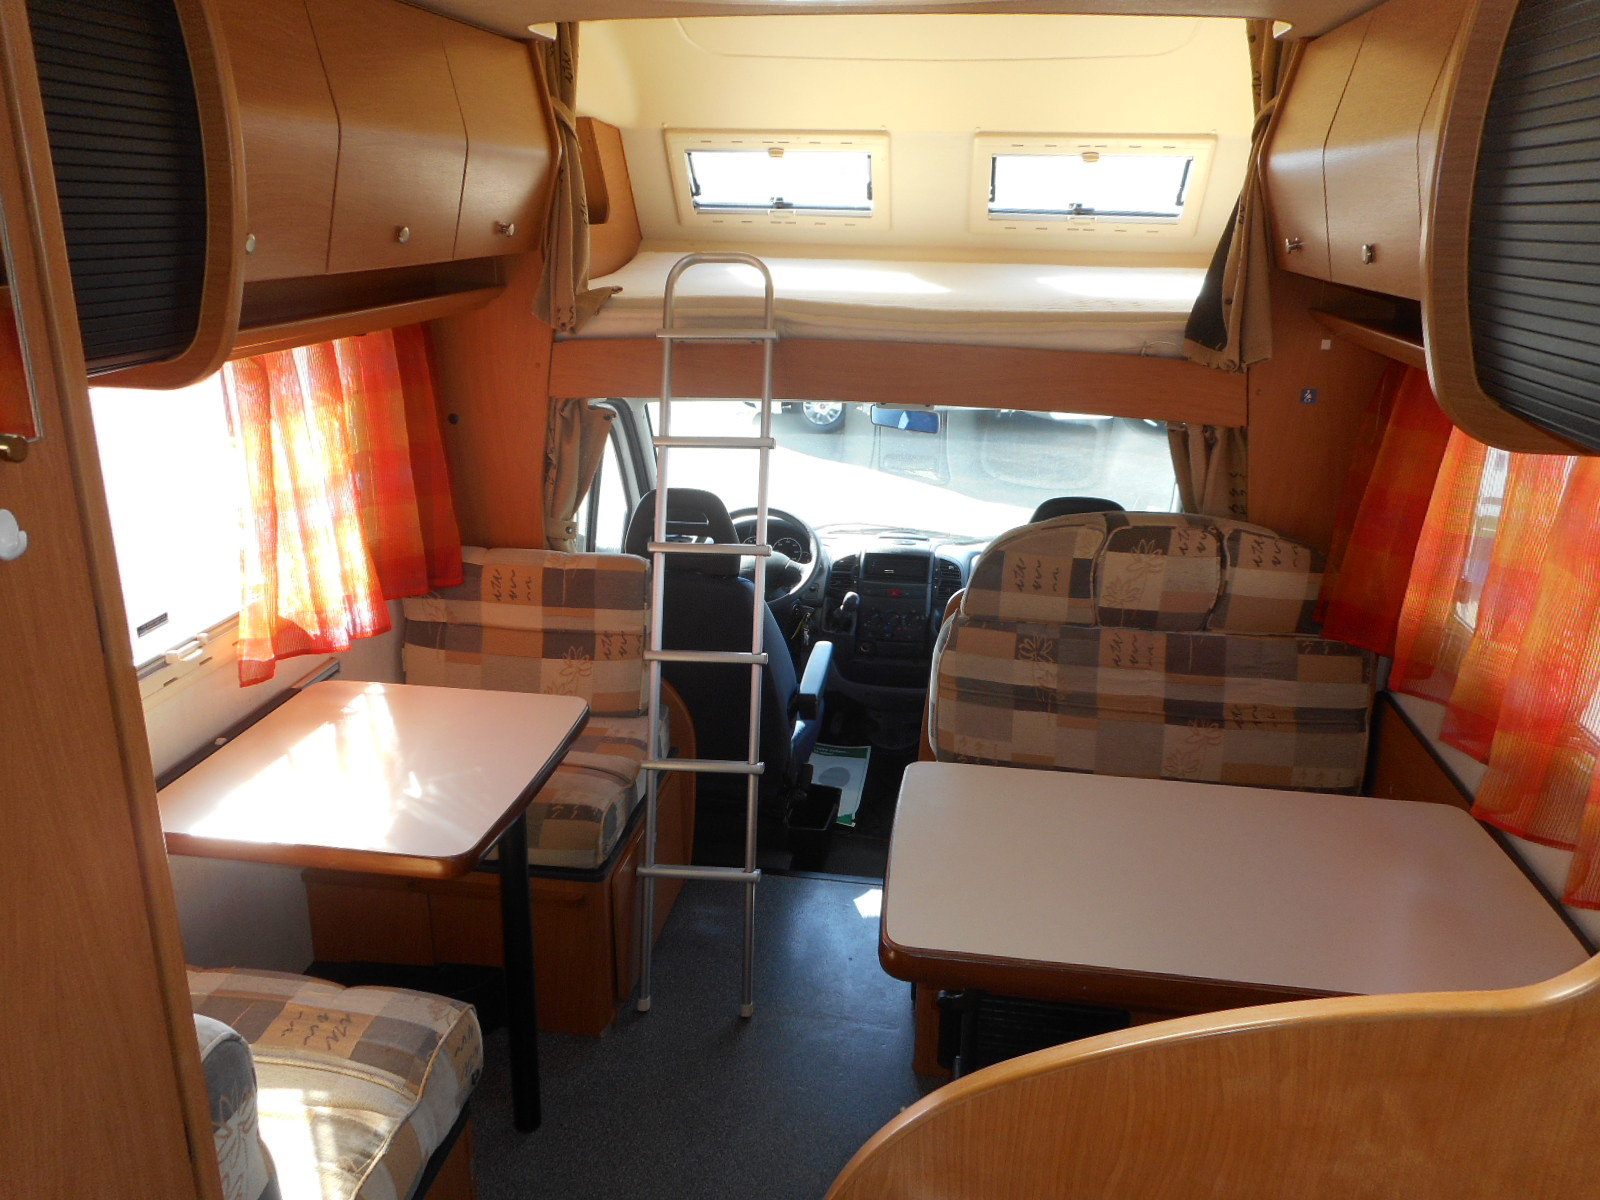 laika ecovip 2 1 occasion de 2003 fiat camping car en vente irun espagne esp. Black Bedroom Furniture Sets. Home Design Ideas